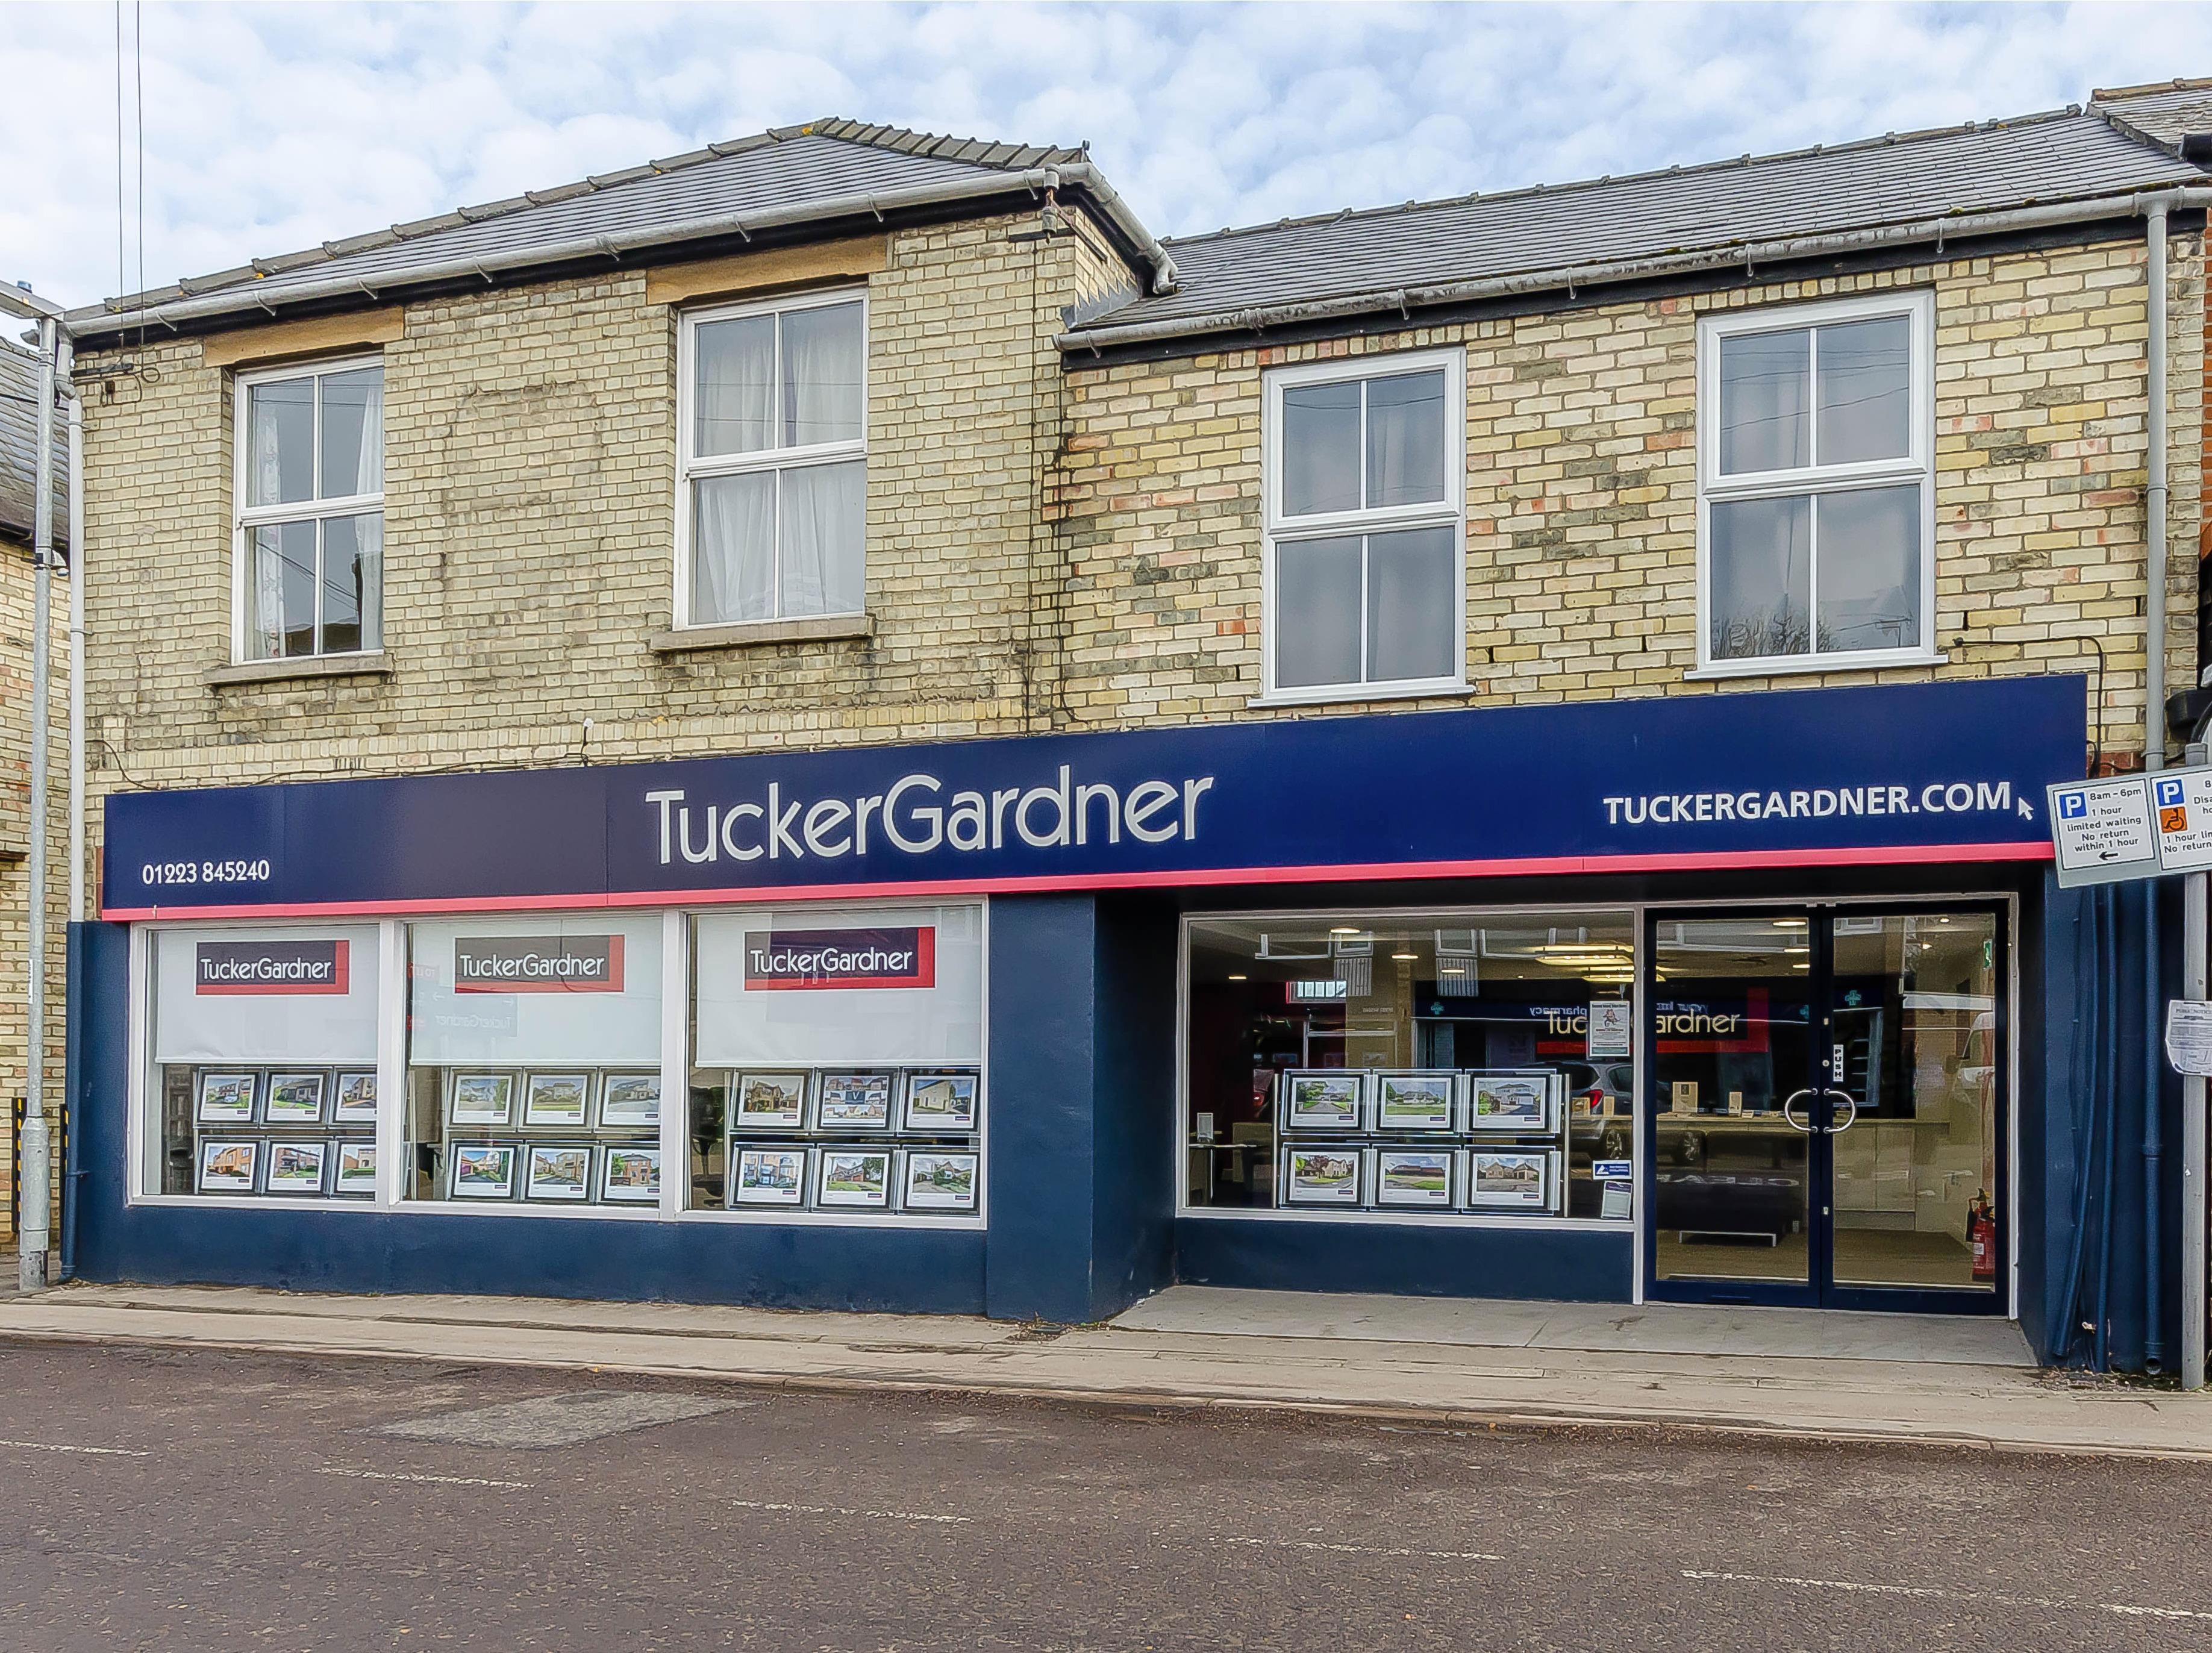 TuckerGardner